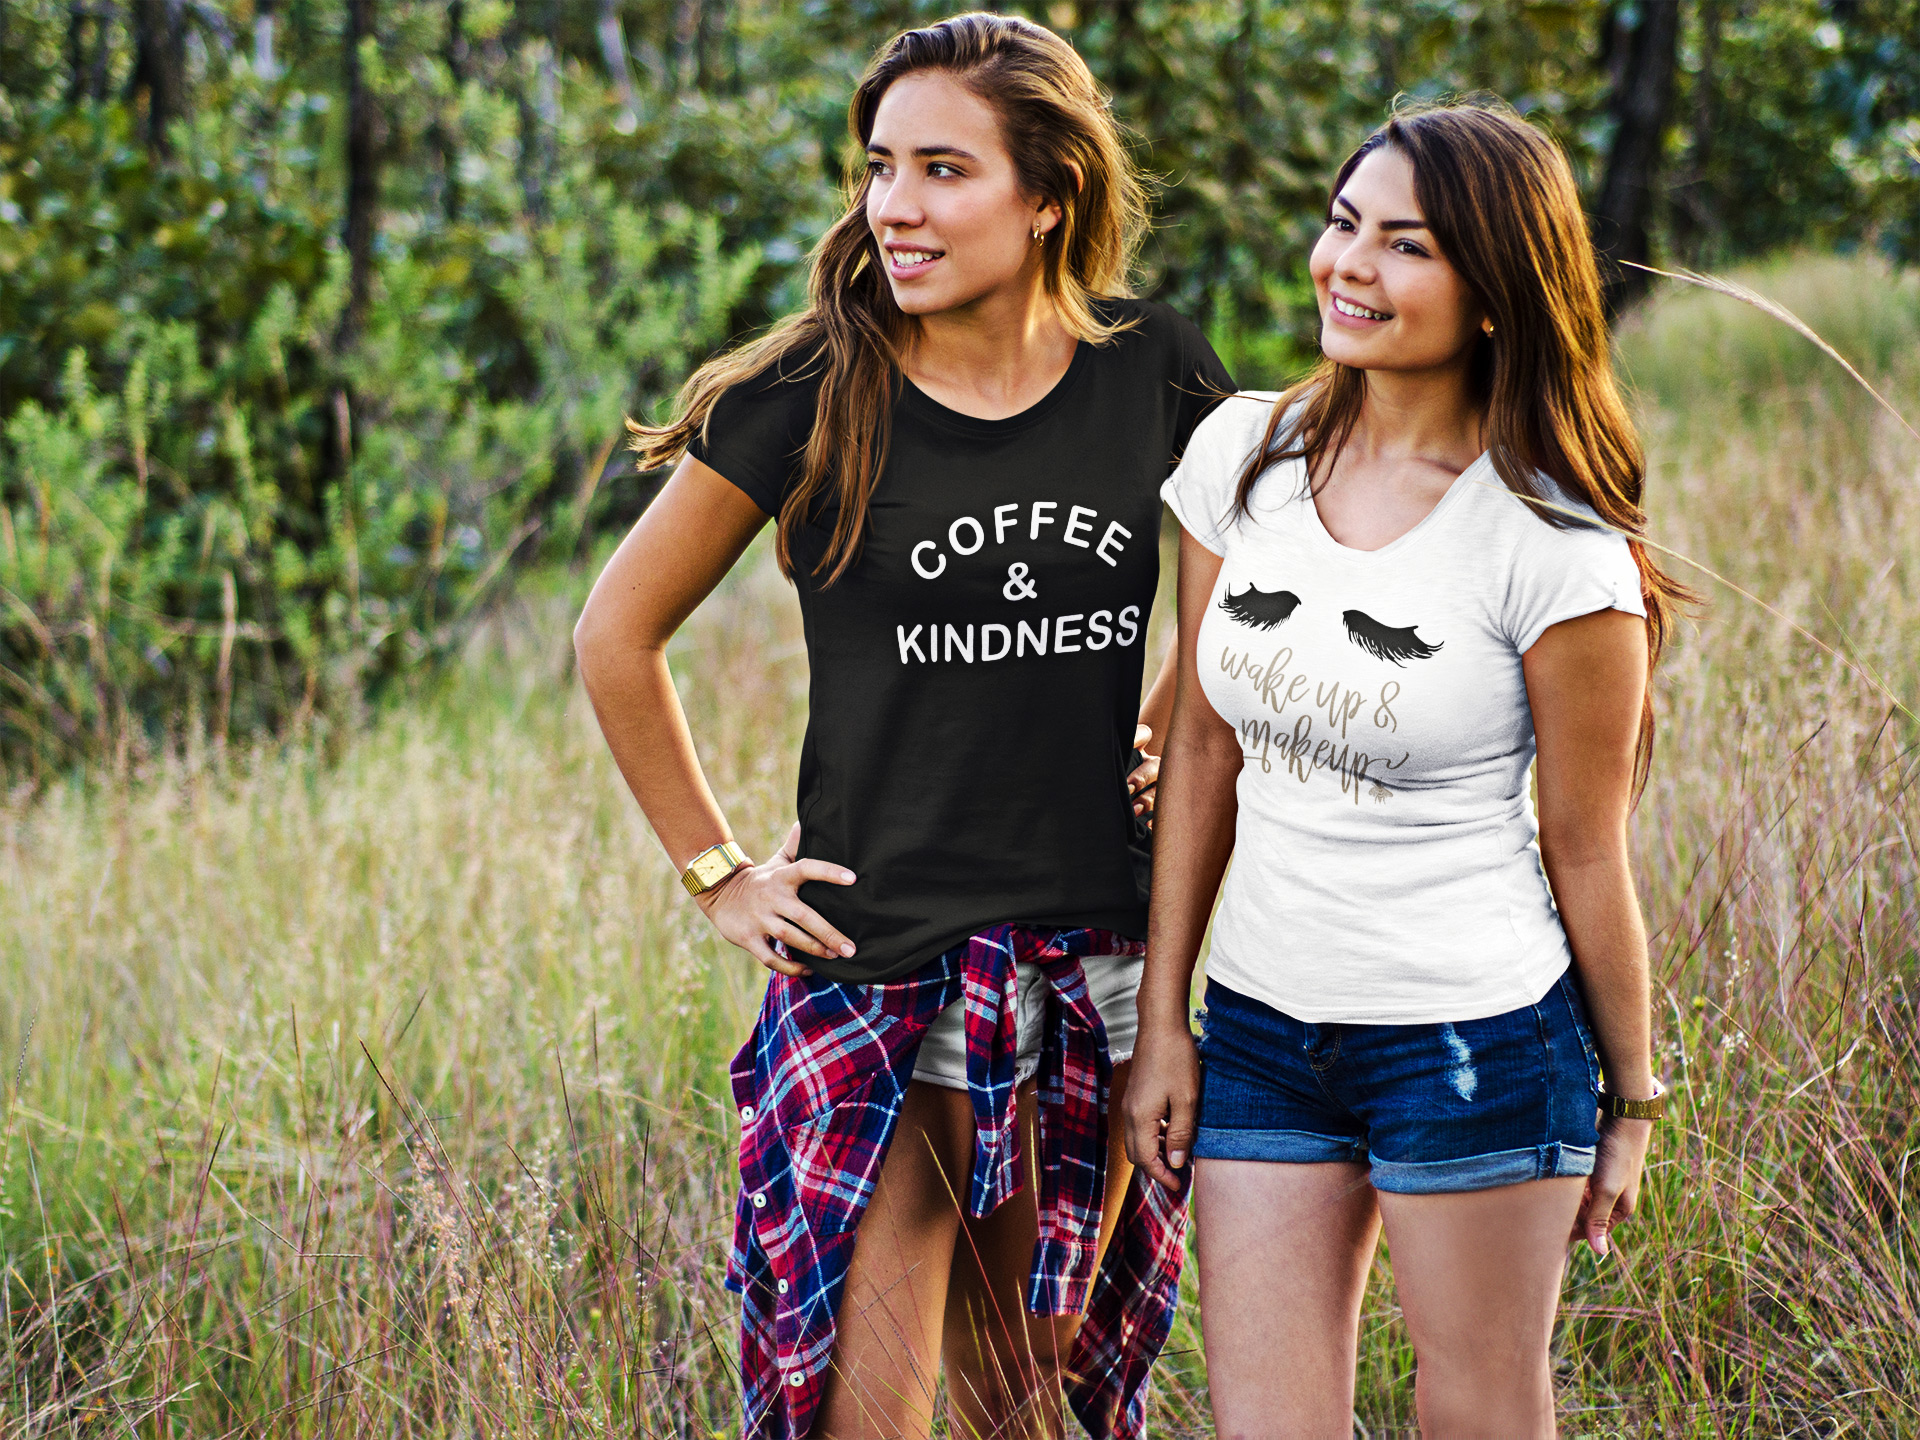 Blume Style Women's Tshirt | Apparel To Inspire Women